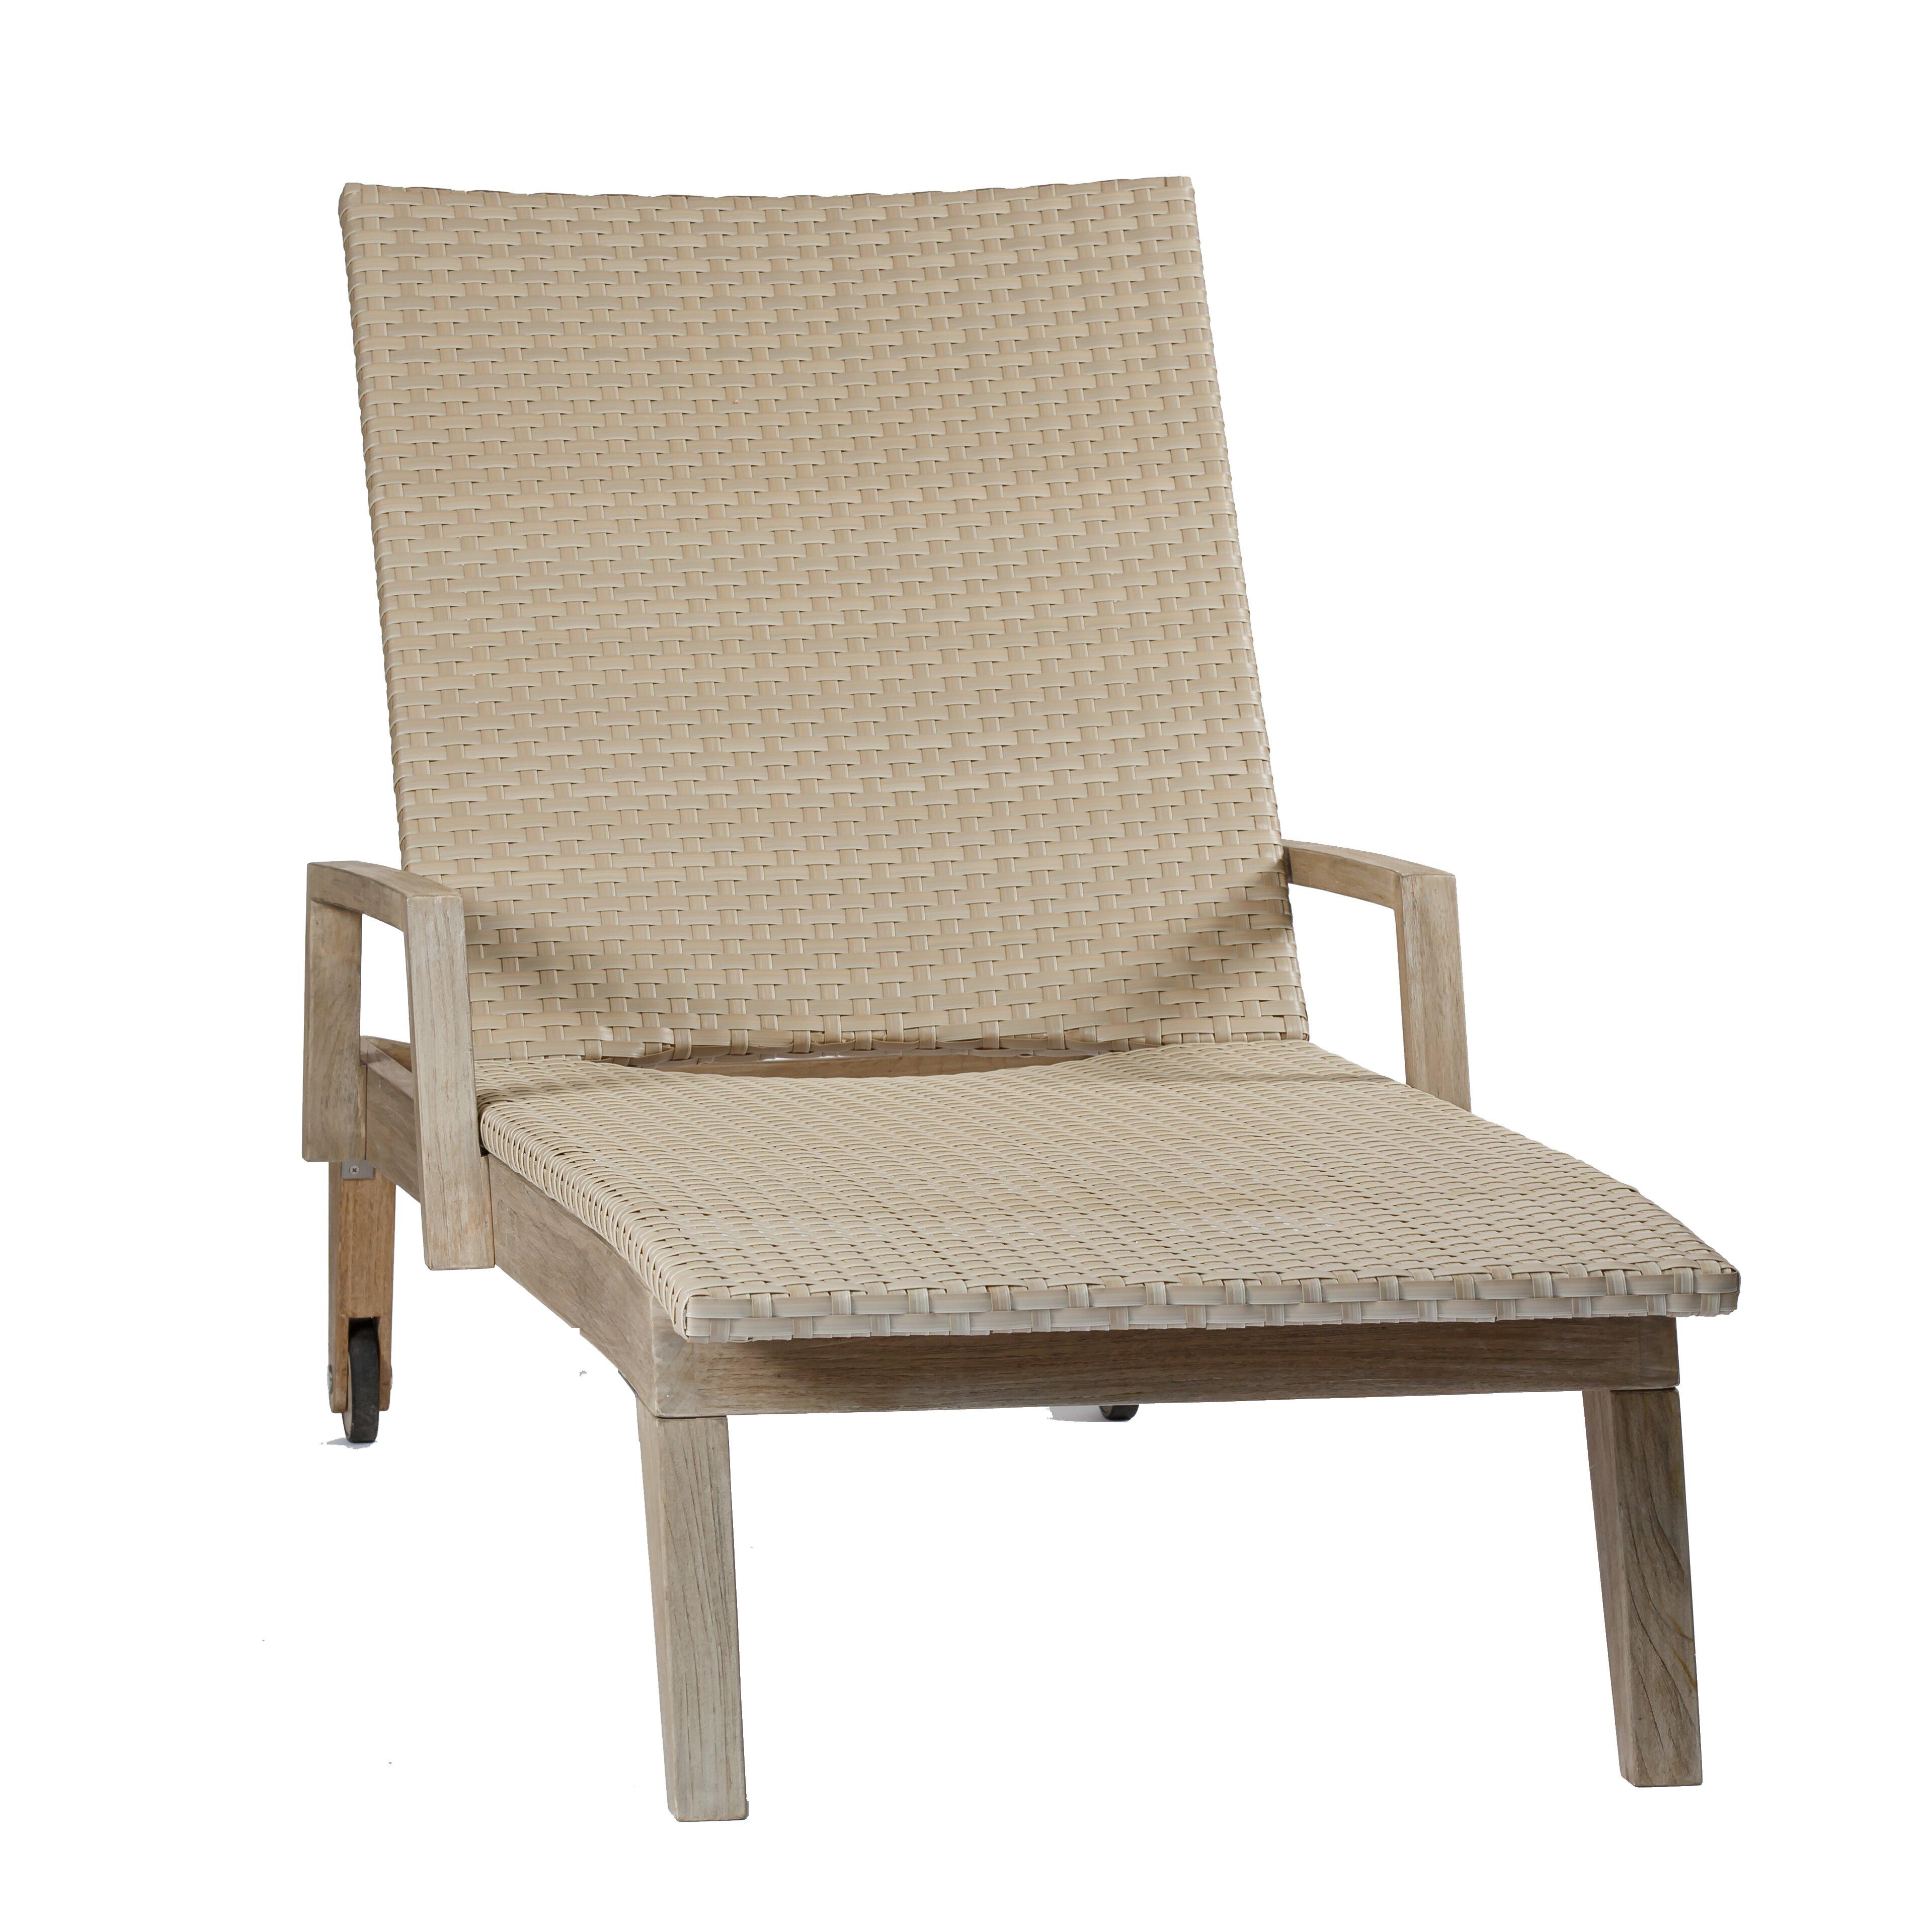 Co9 Design Summit Sun Chaise Lounge Reviews Wayfair